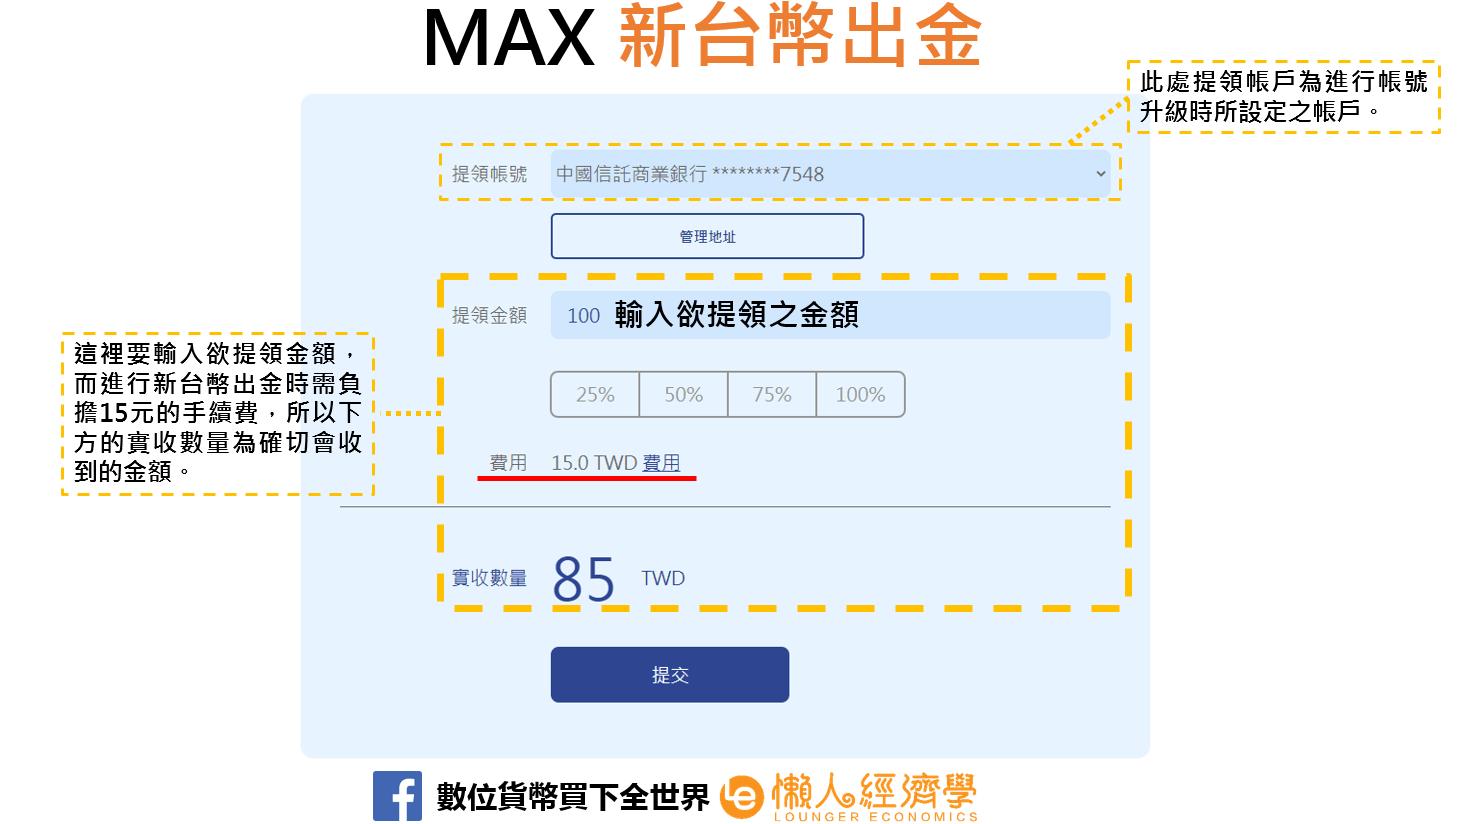 MAX新台幣出金2